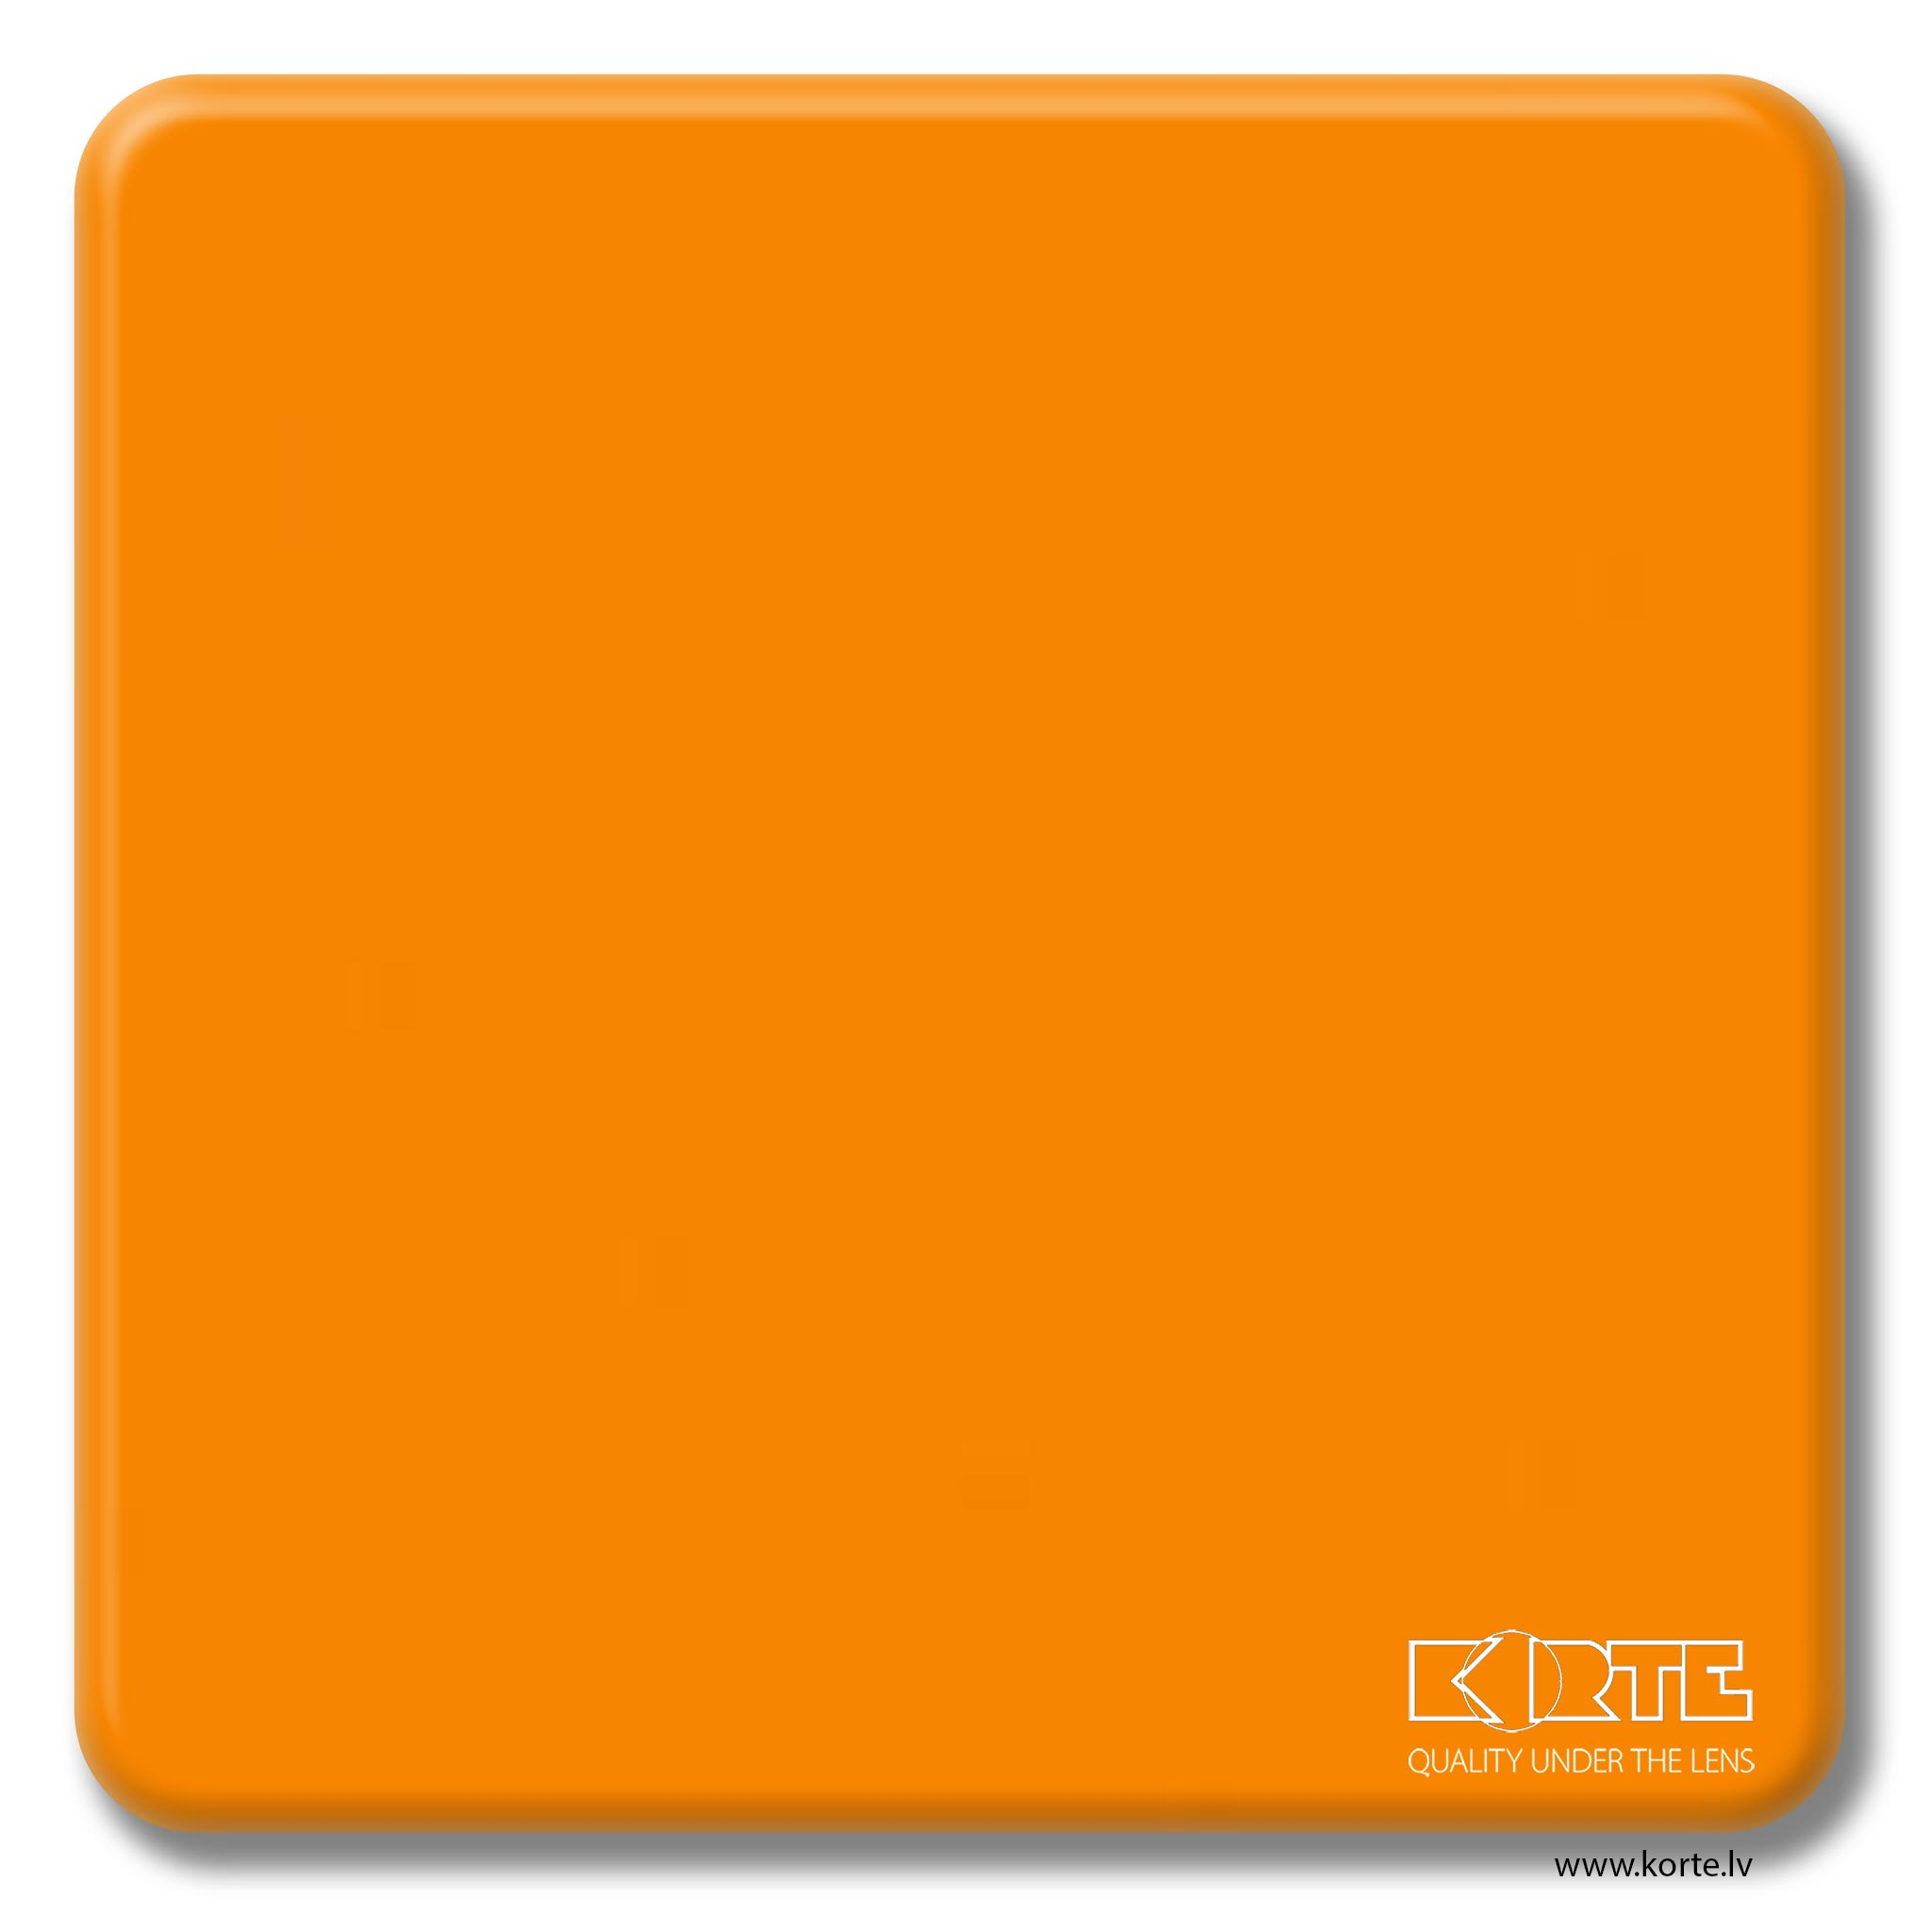 Lyric Tangerine